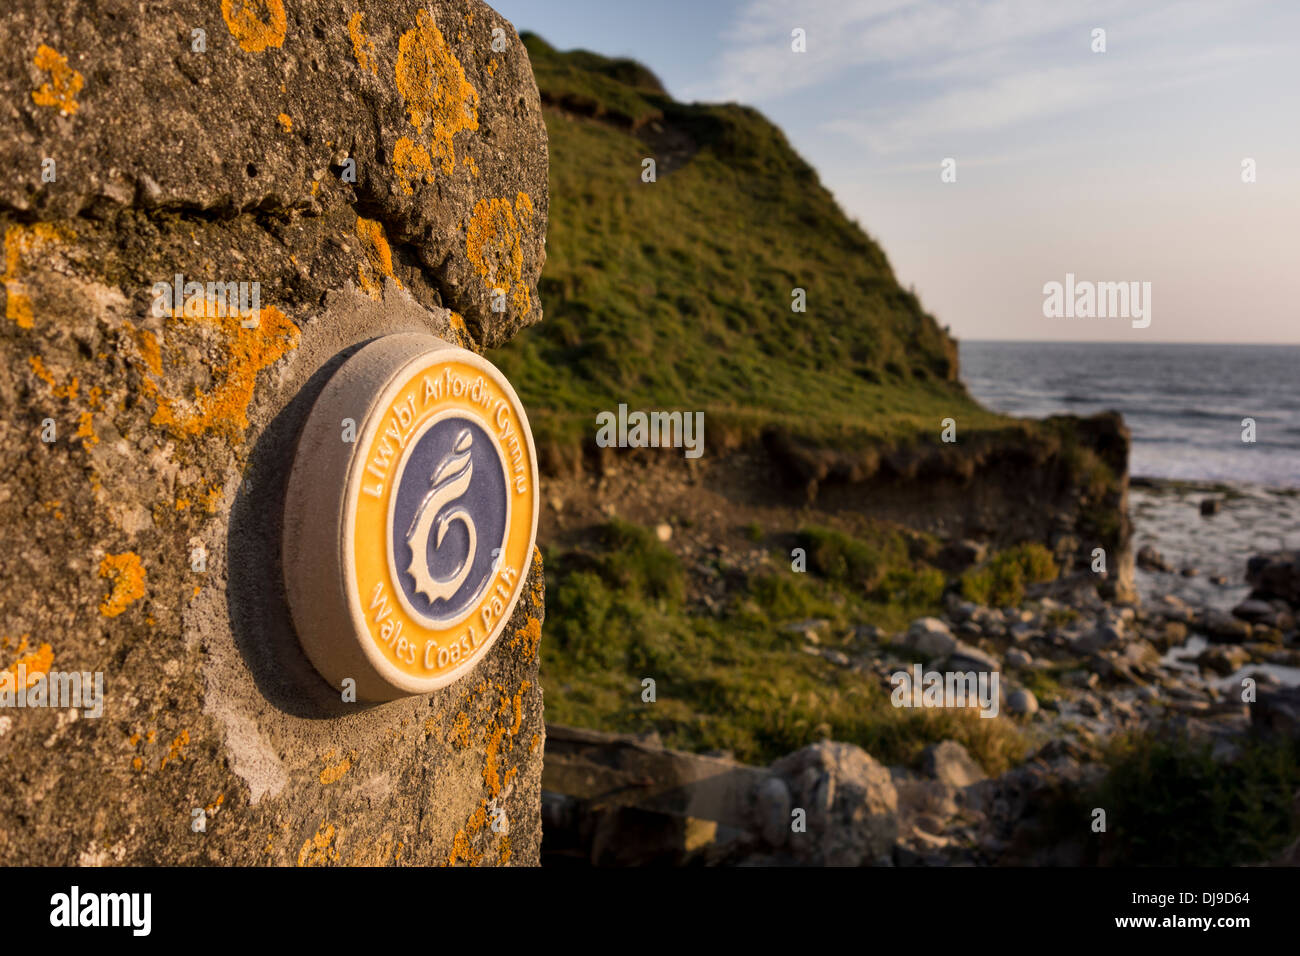 Wales Coast Path sign at the Glamorgan Heritage Coast near Monk Nash, Vale of Glamorgan, South Wales - Stock Image